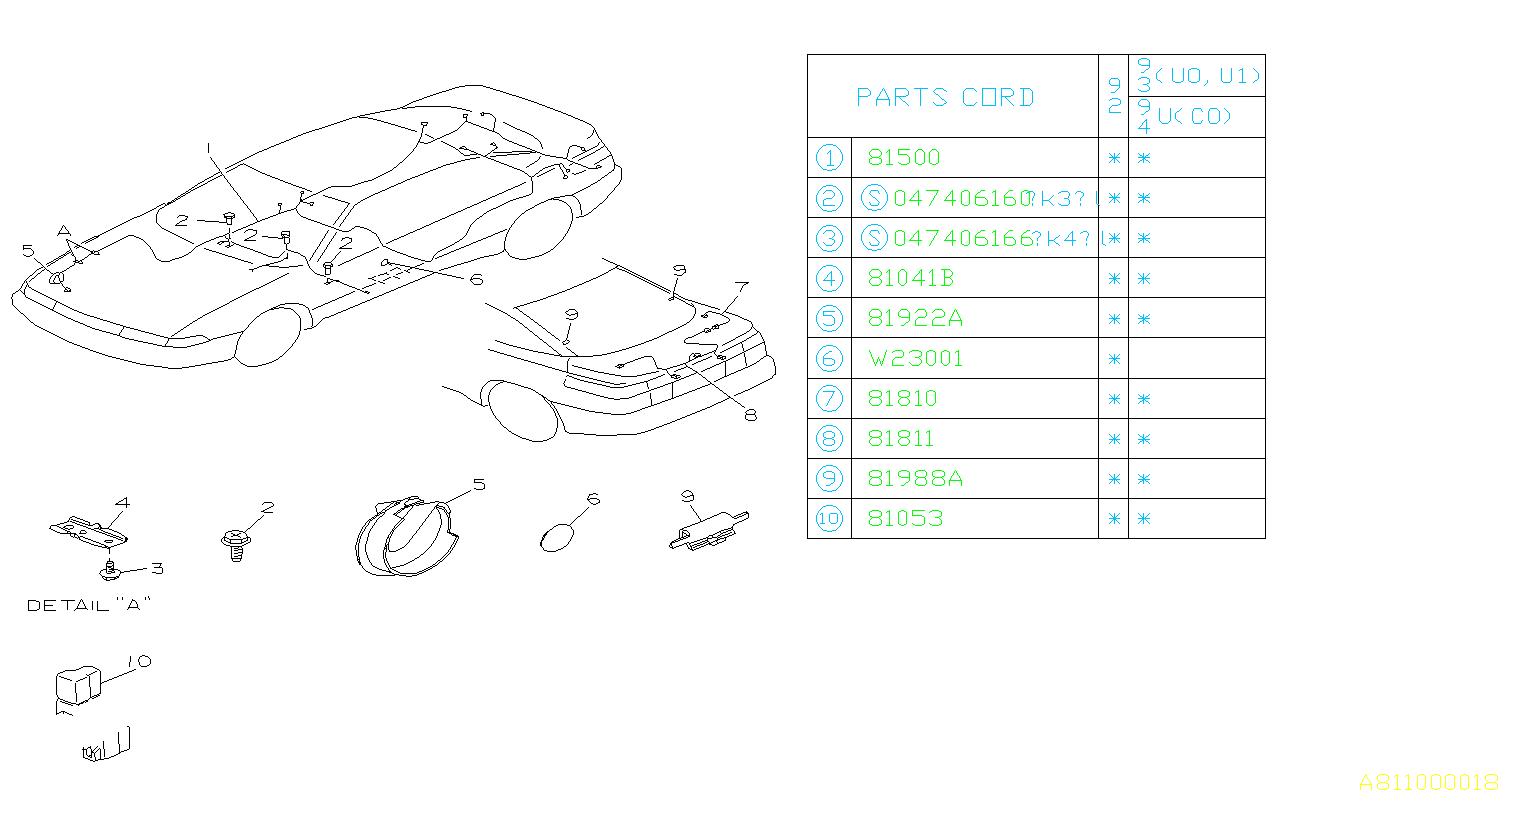 Subaru SVX Hole Plug. (Right). RH SIDE. HARNESS, WIRING